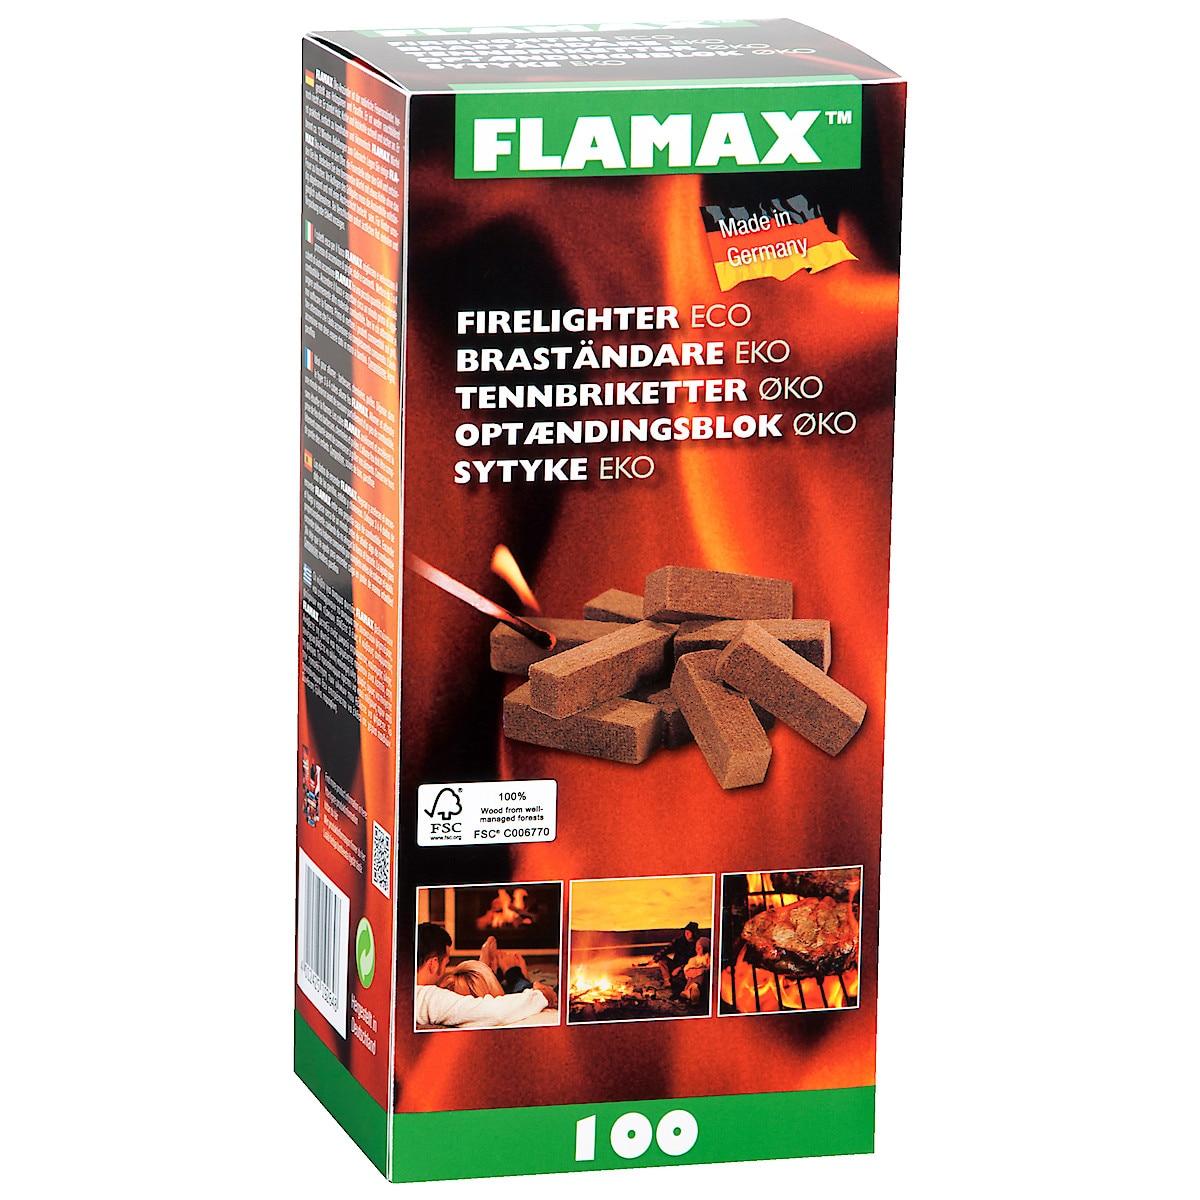 Tändkuber Flamax